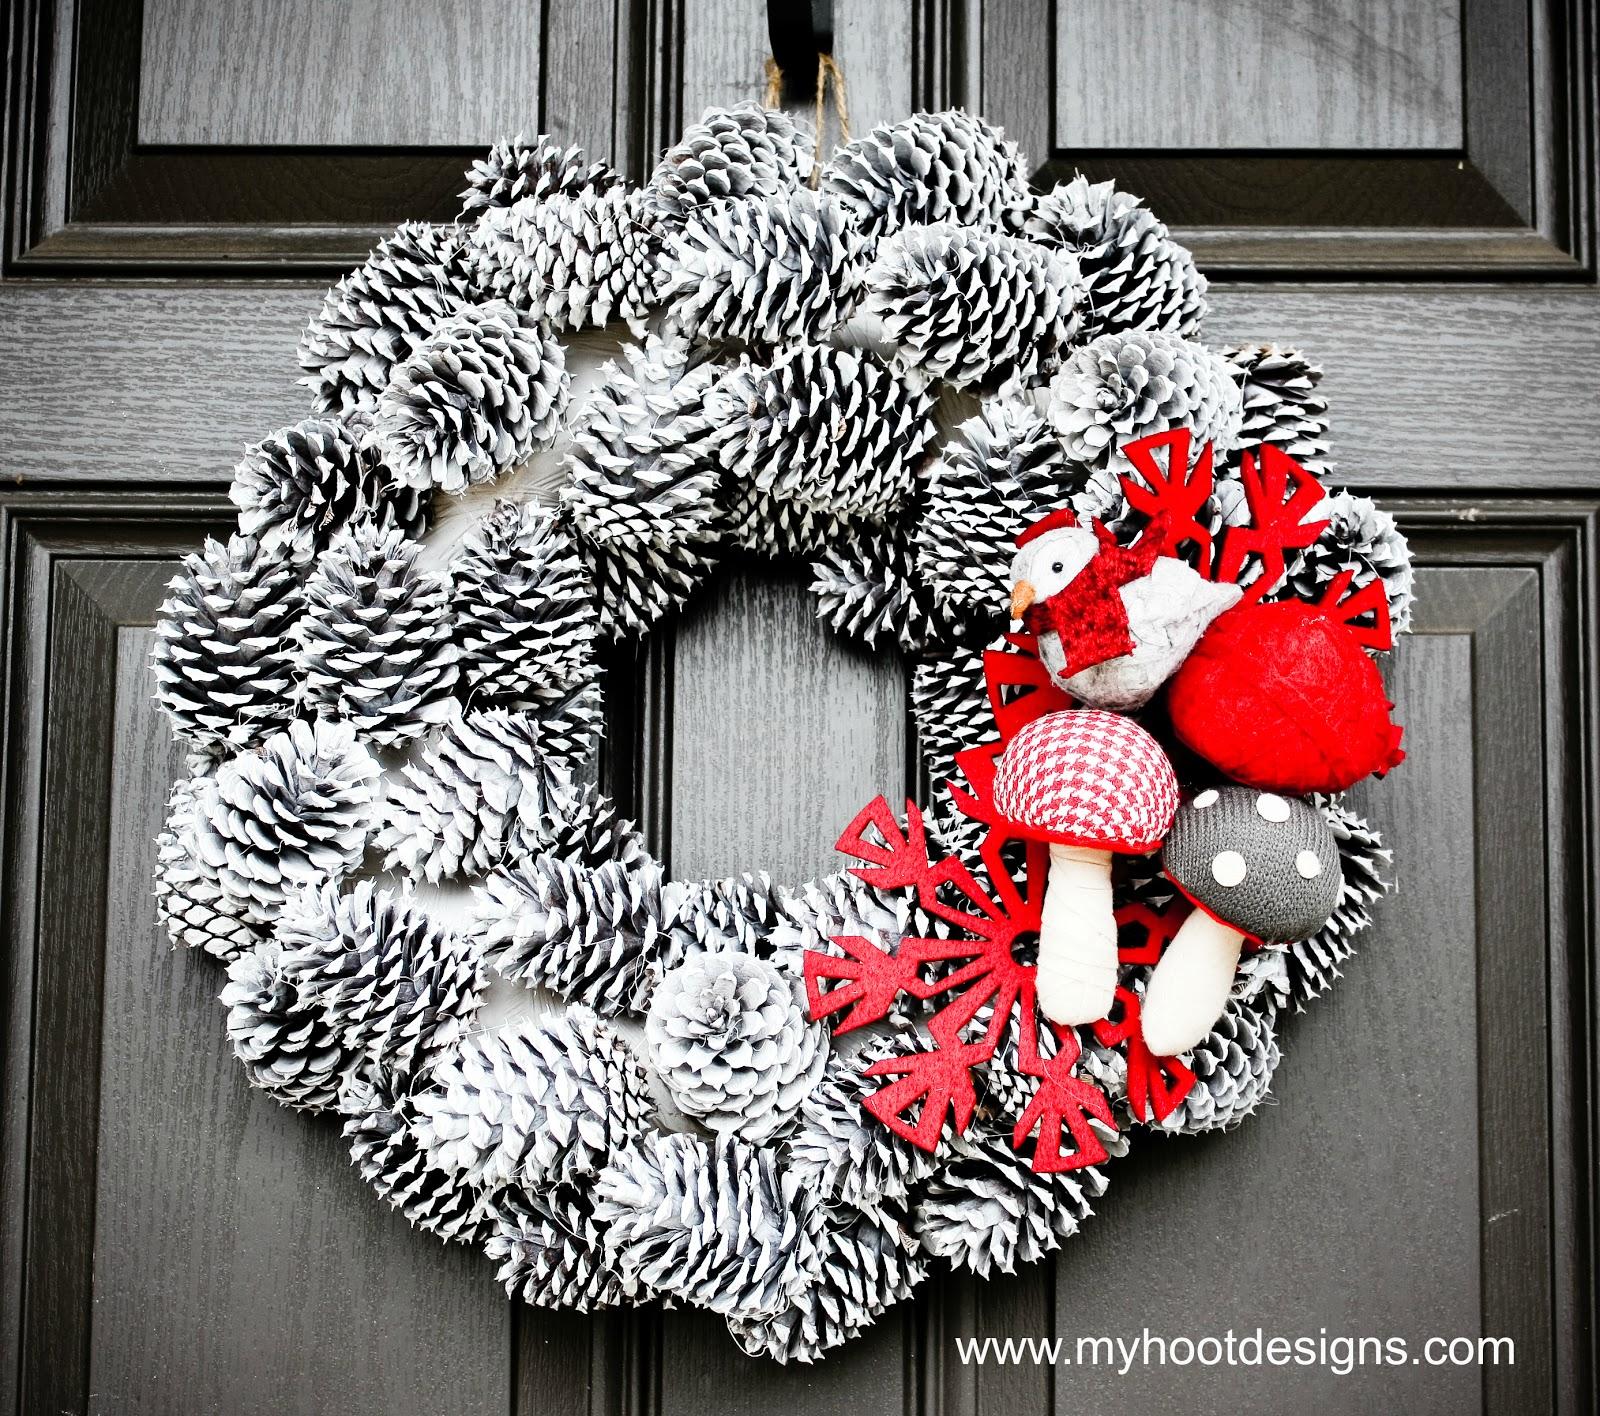 Wreath Ideas: Hoot Designs: Holiday Winter Woodland Wreath